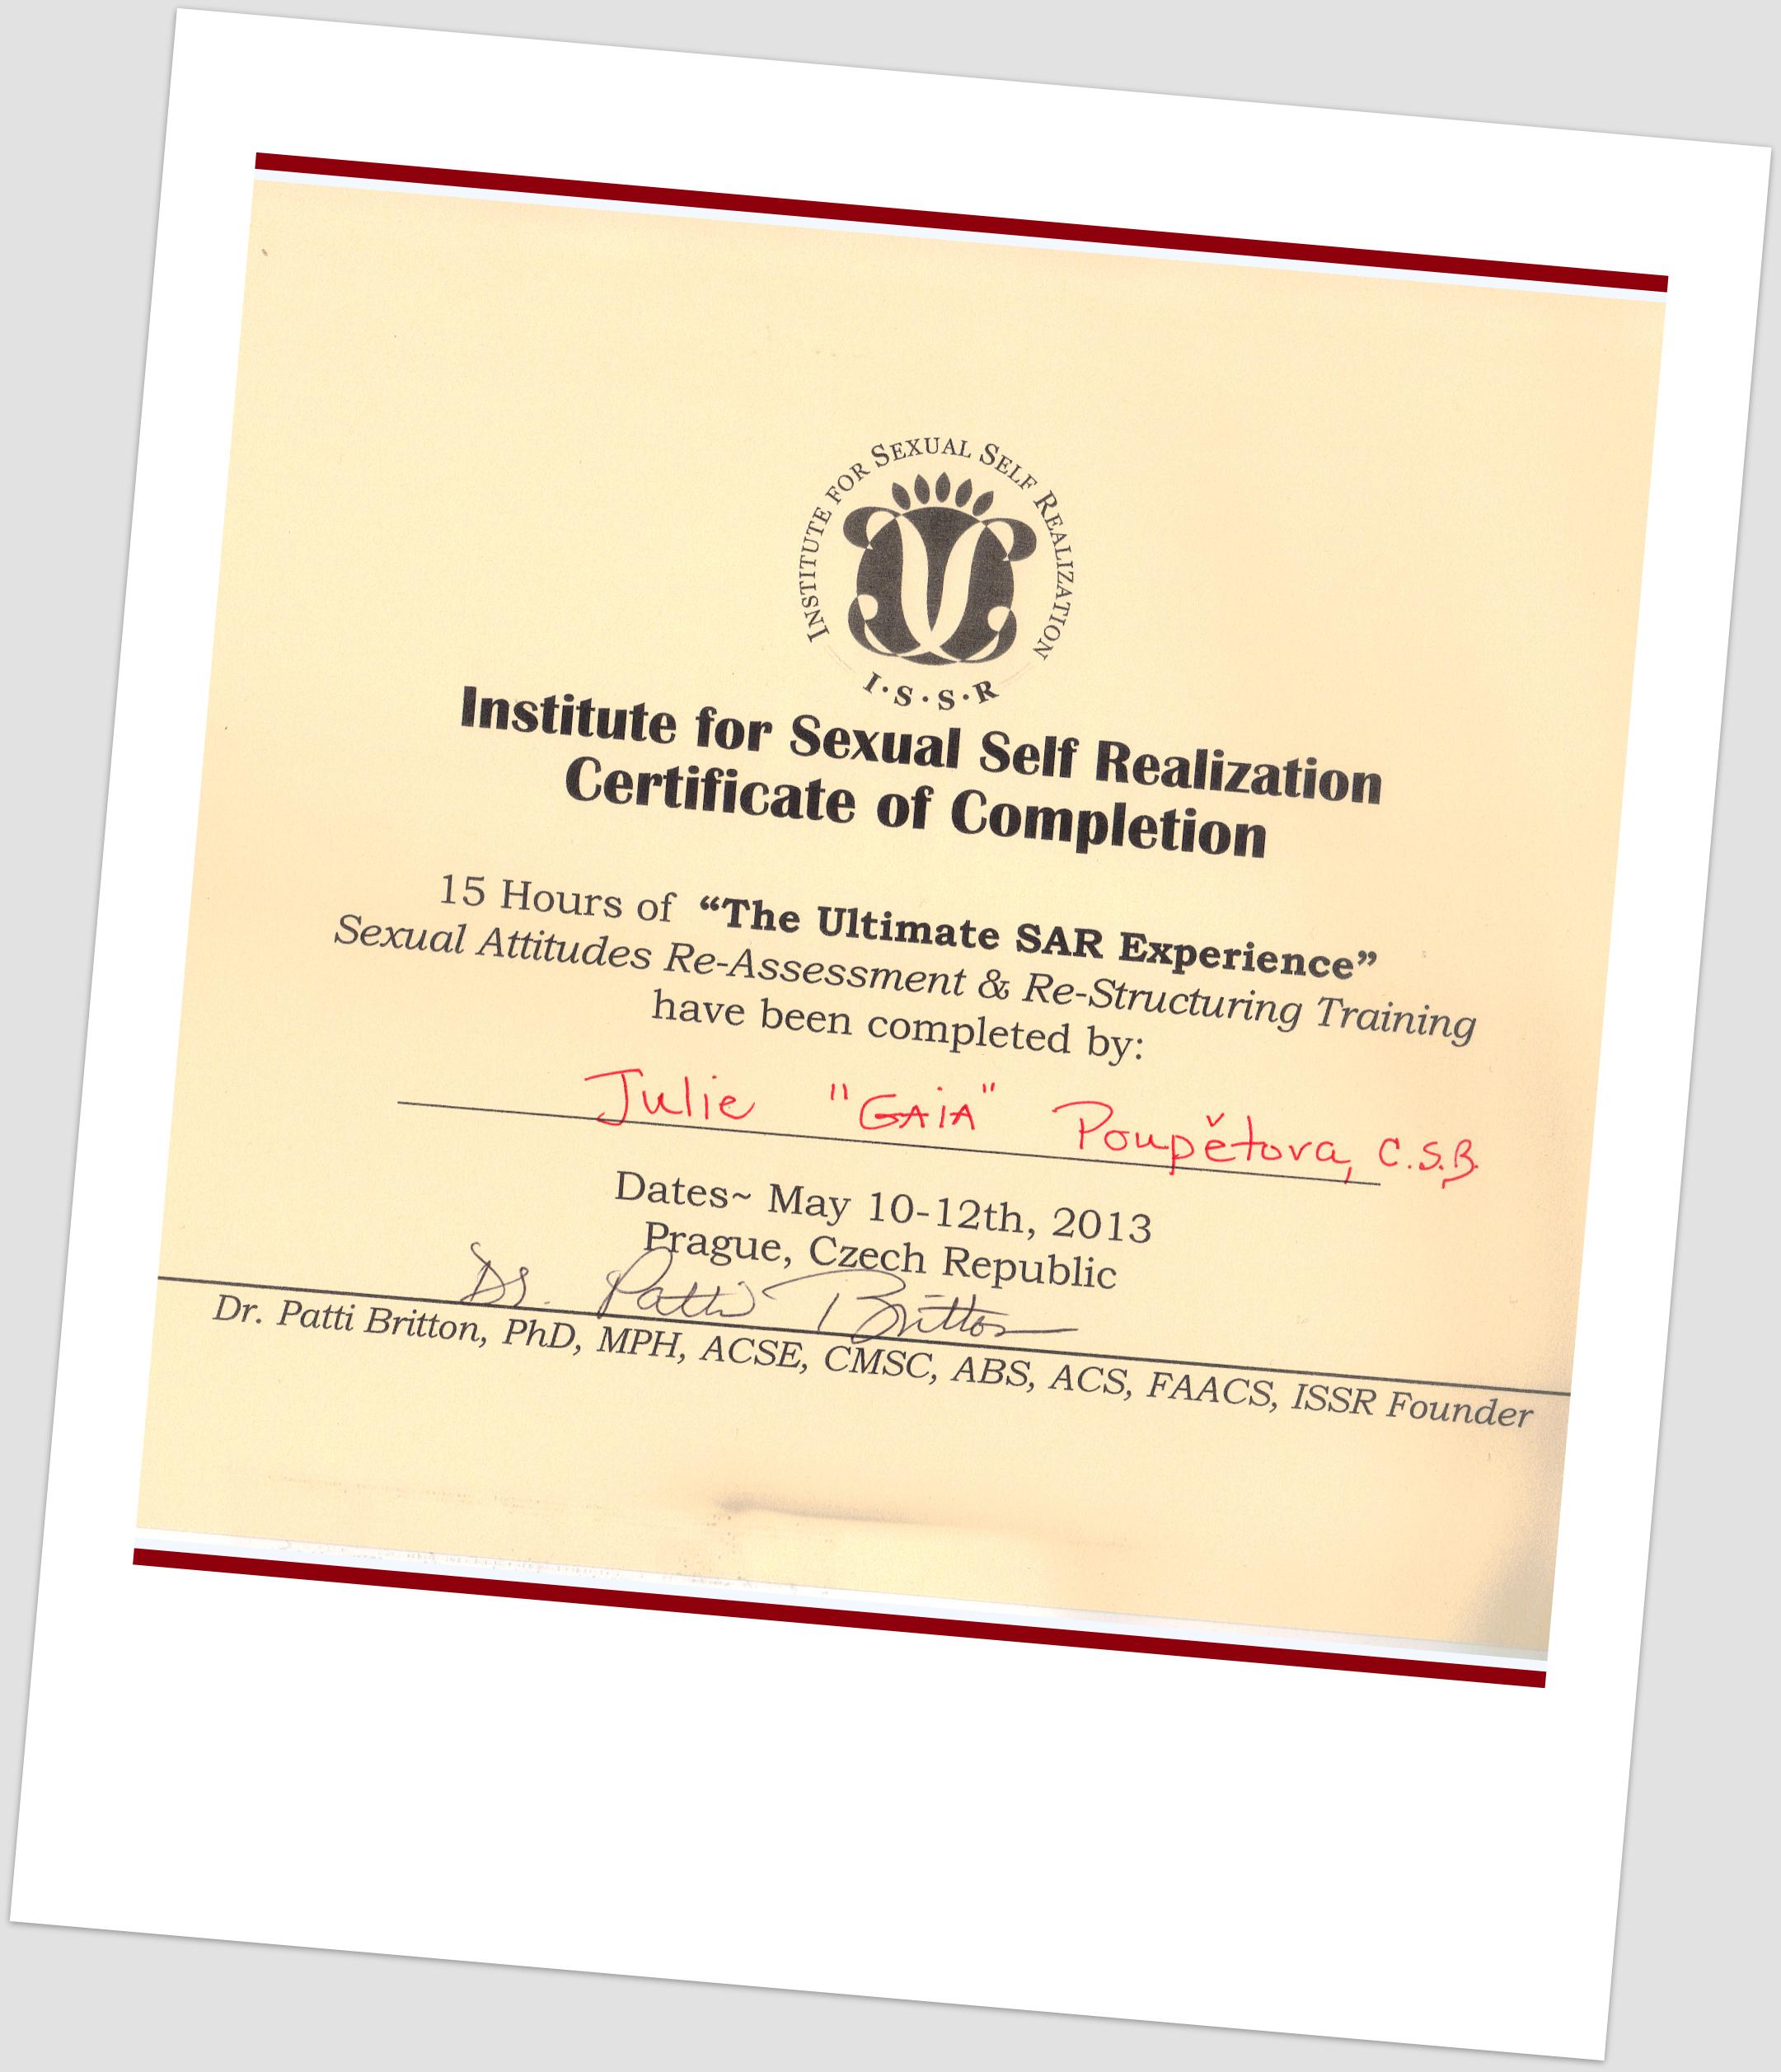 ISSR_SAR_Certificate_2013_Small.jpg